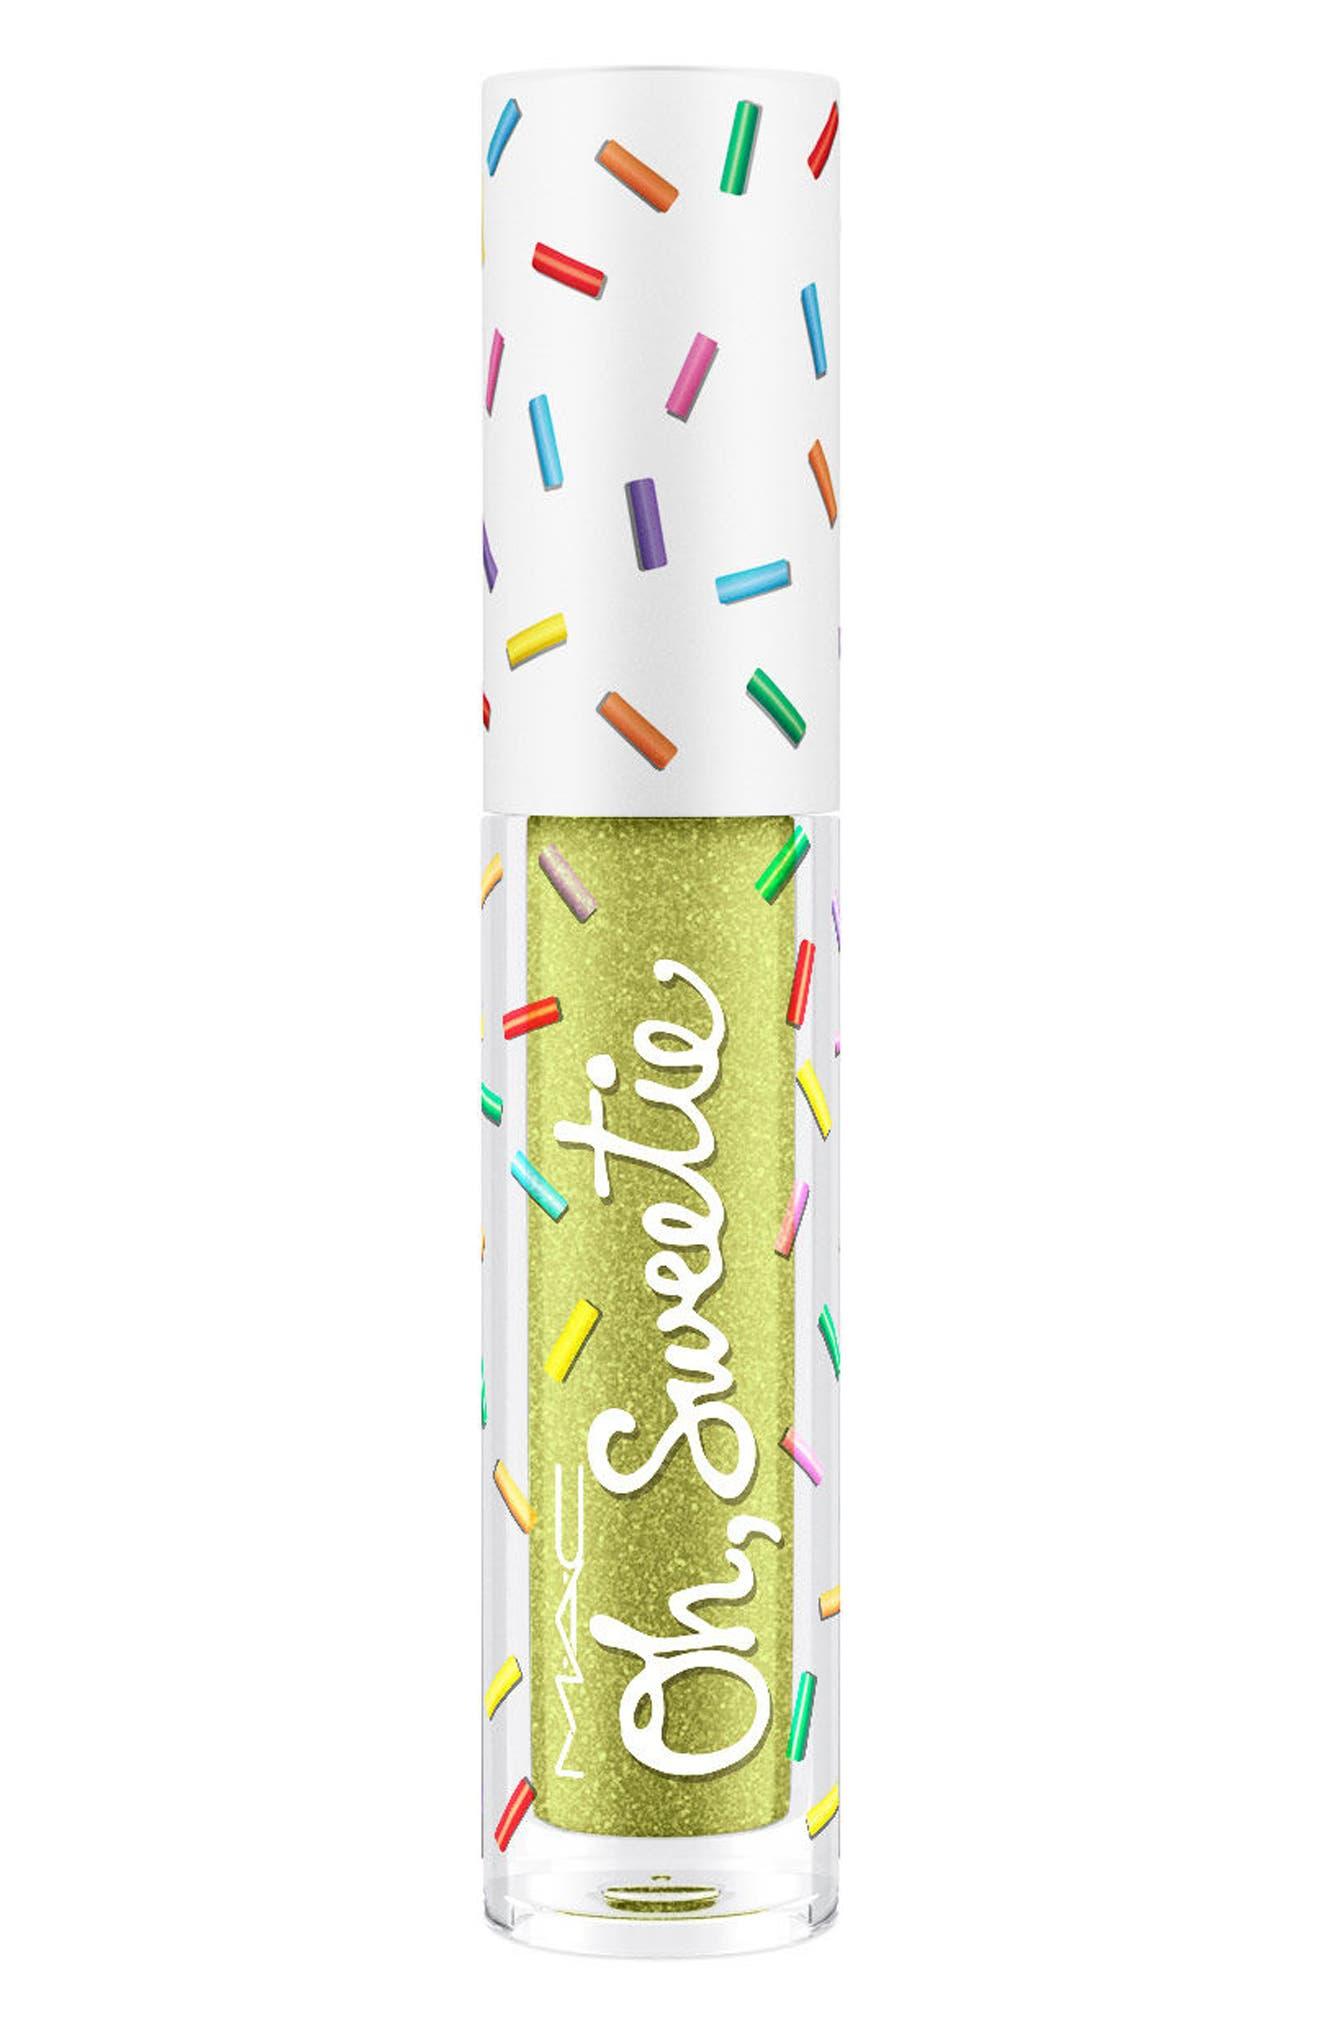 Image of MAC Cosmetics MAC Oh, Sweetie Lipcolor